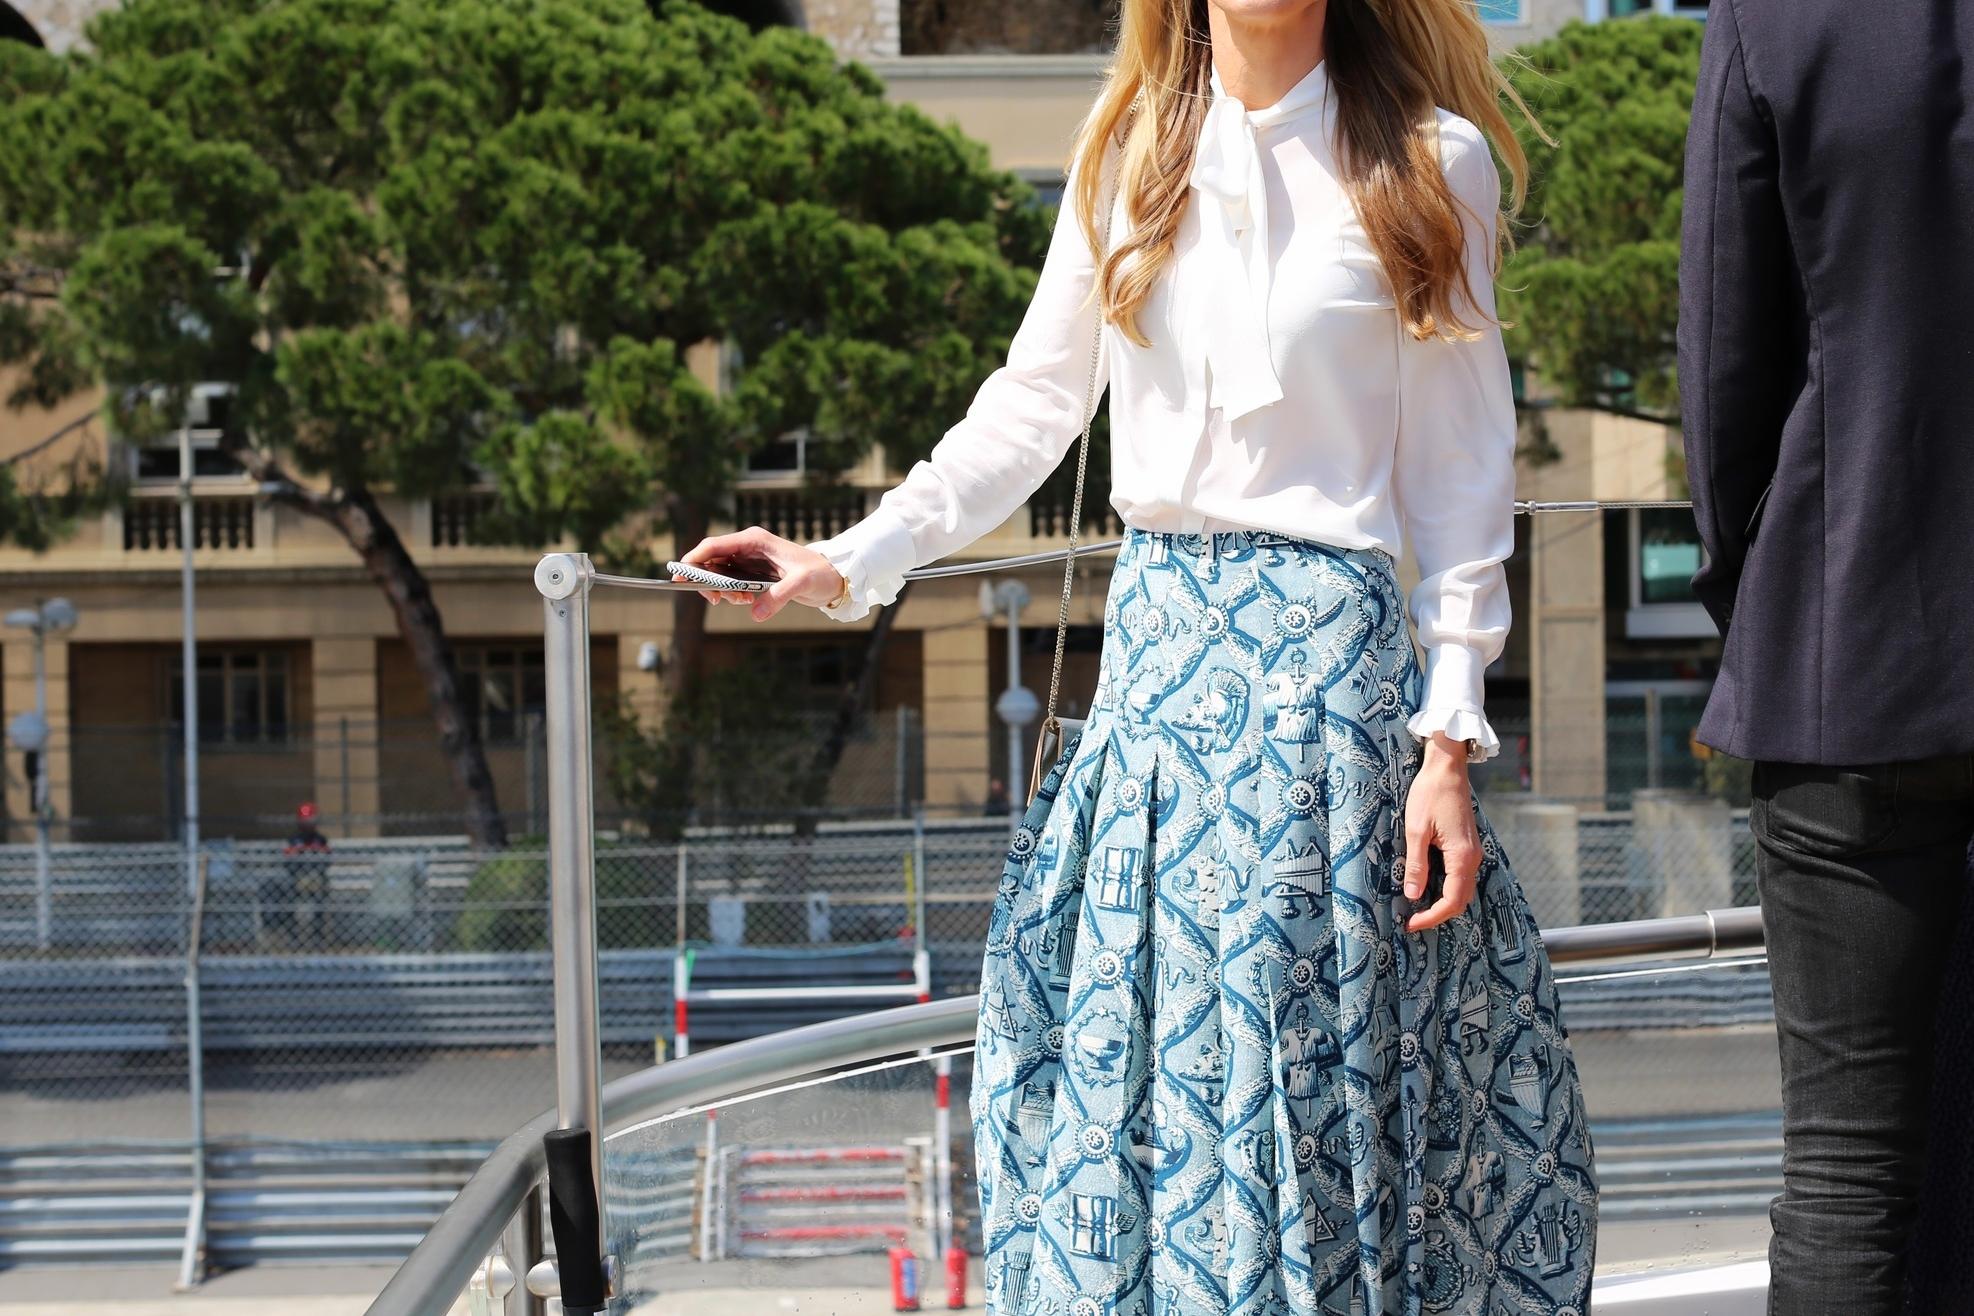 Skirt: Gucci, Blouse: Karl Lagerfeld